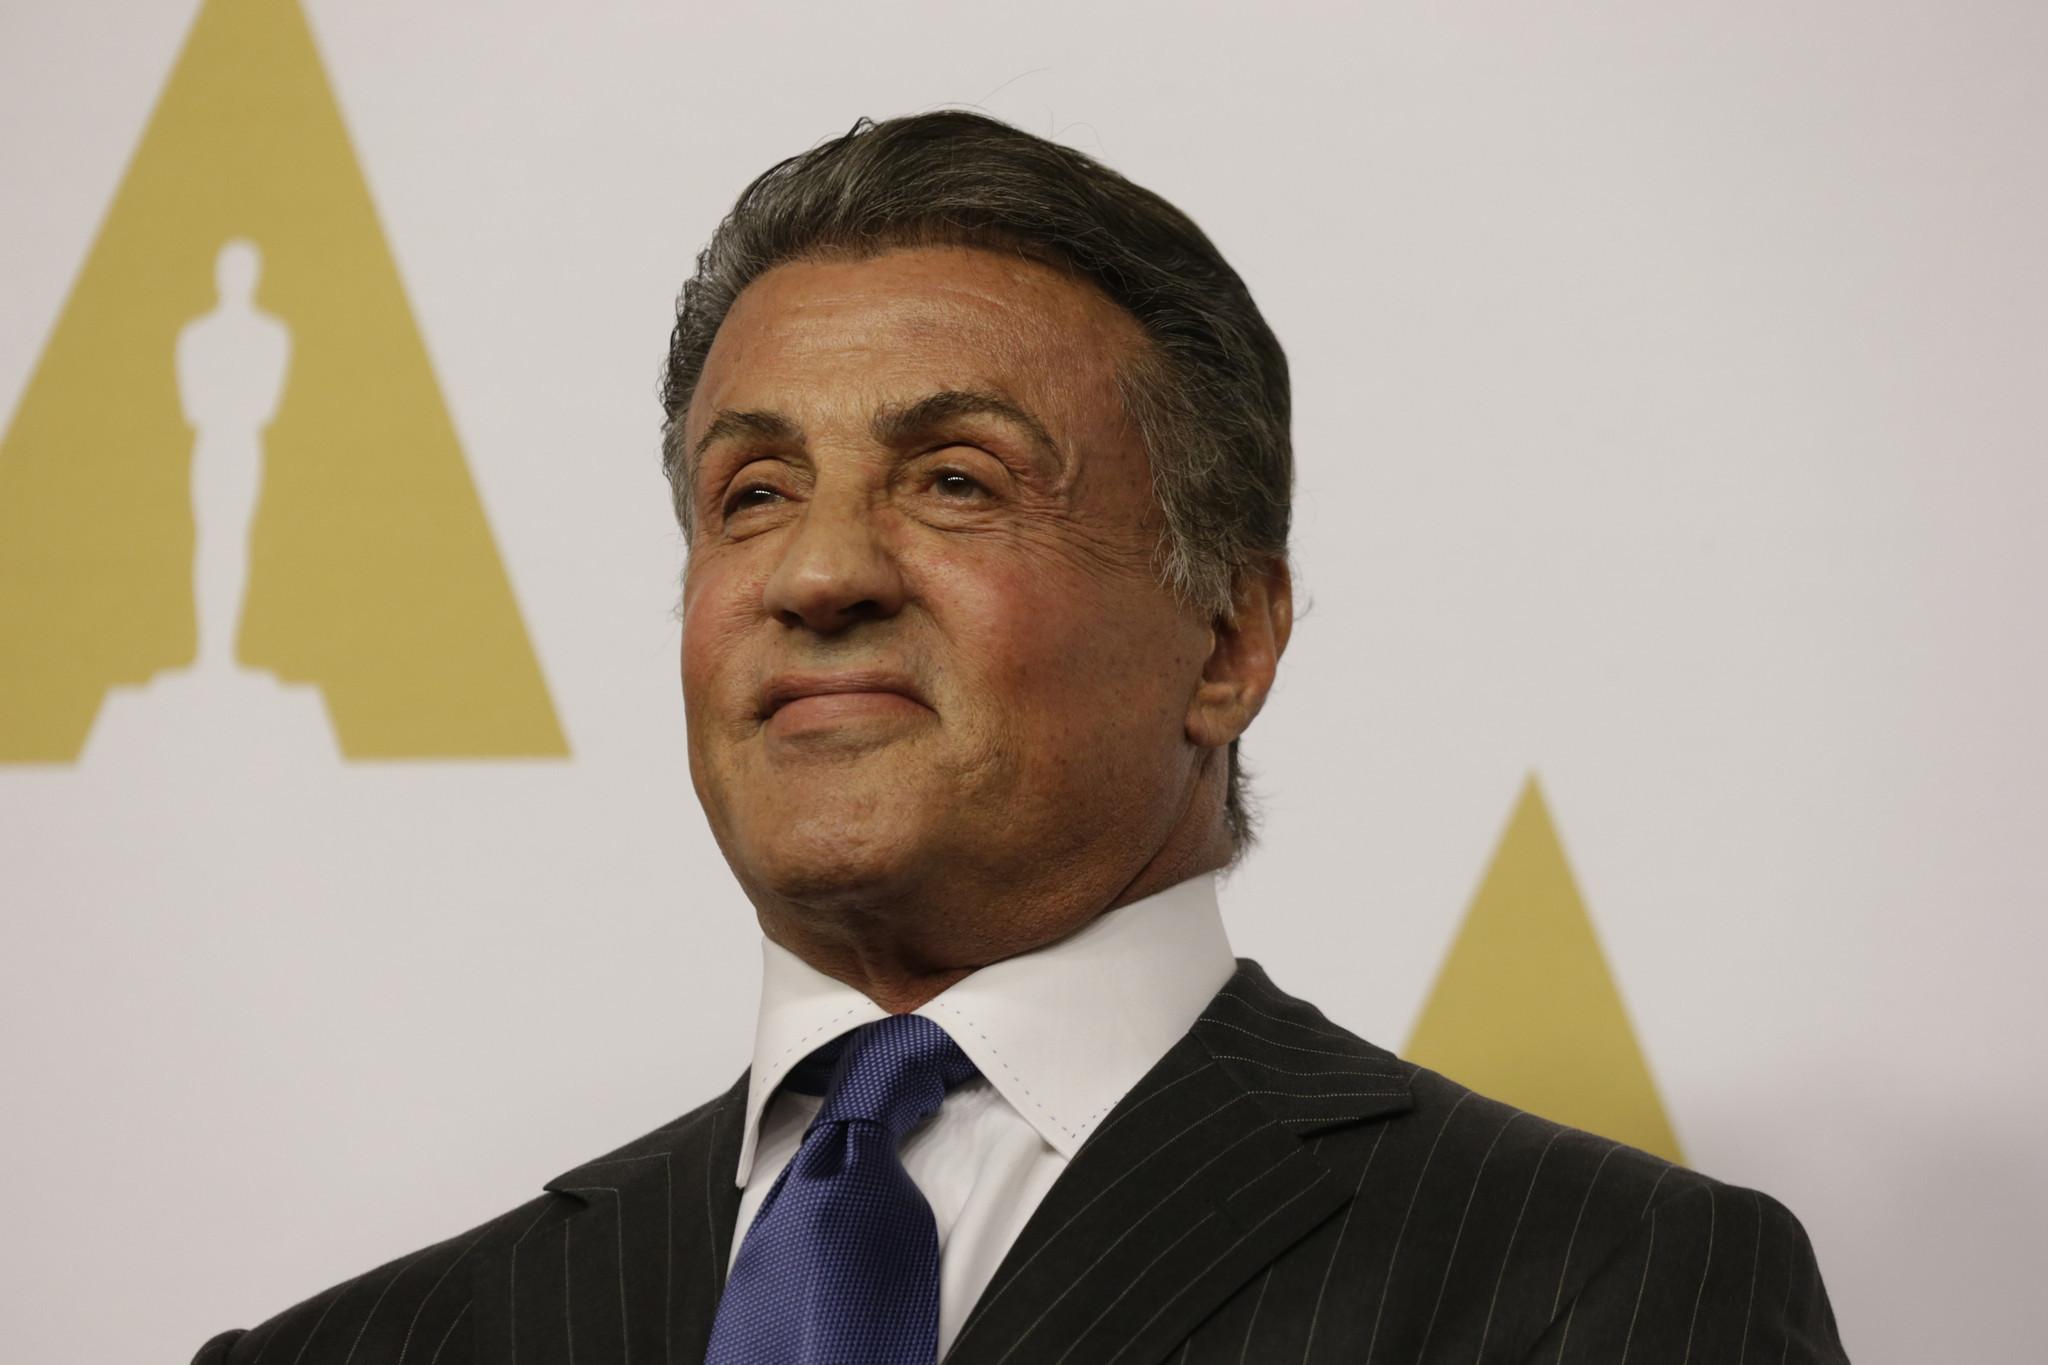 Sylvester Stallone Background